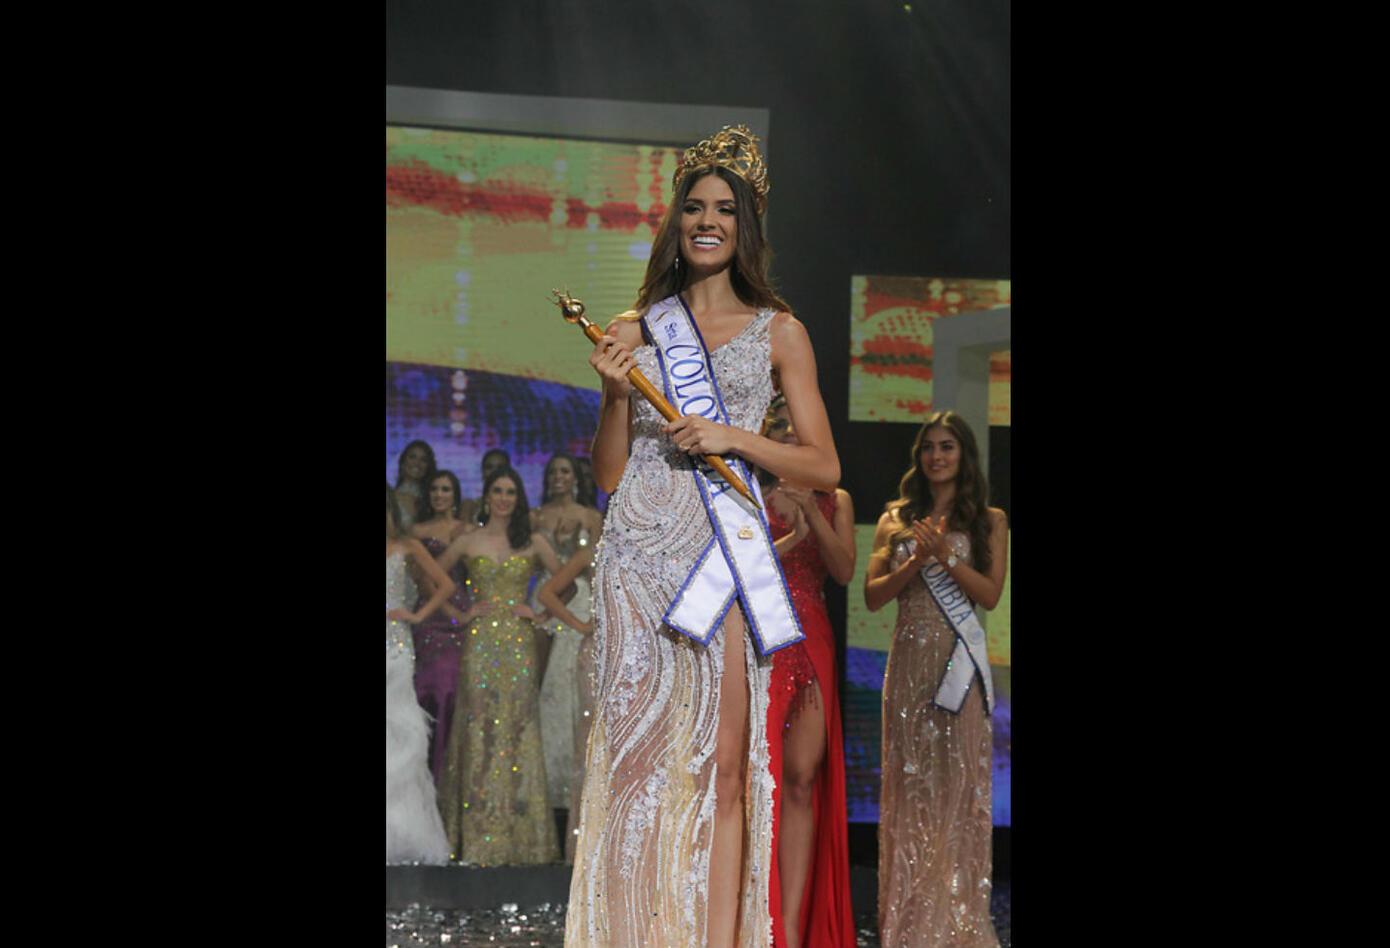 Gabriela Tafur, señorita Colombia 2019